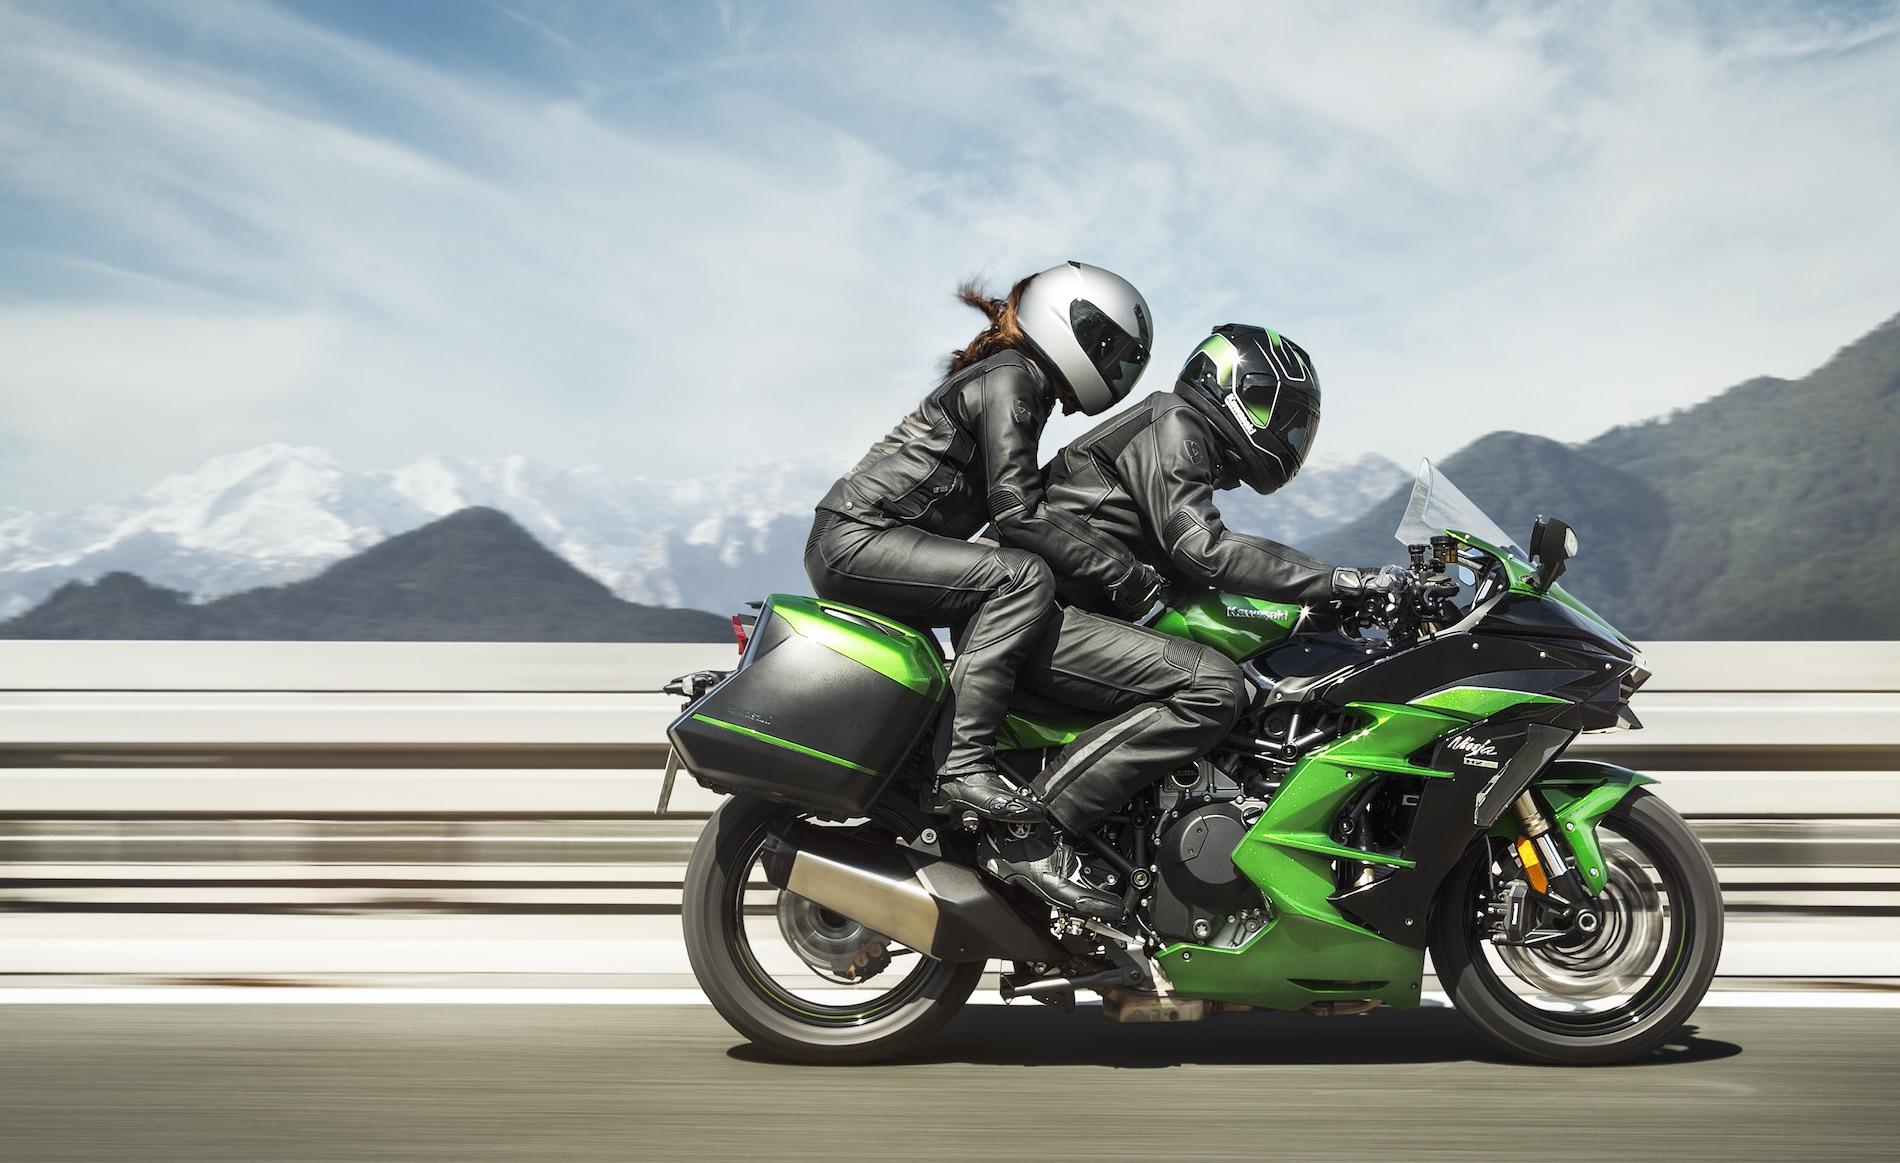 Kawasaki Ninja H2 SX y Ninja H2 SX SE 2018